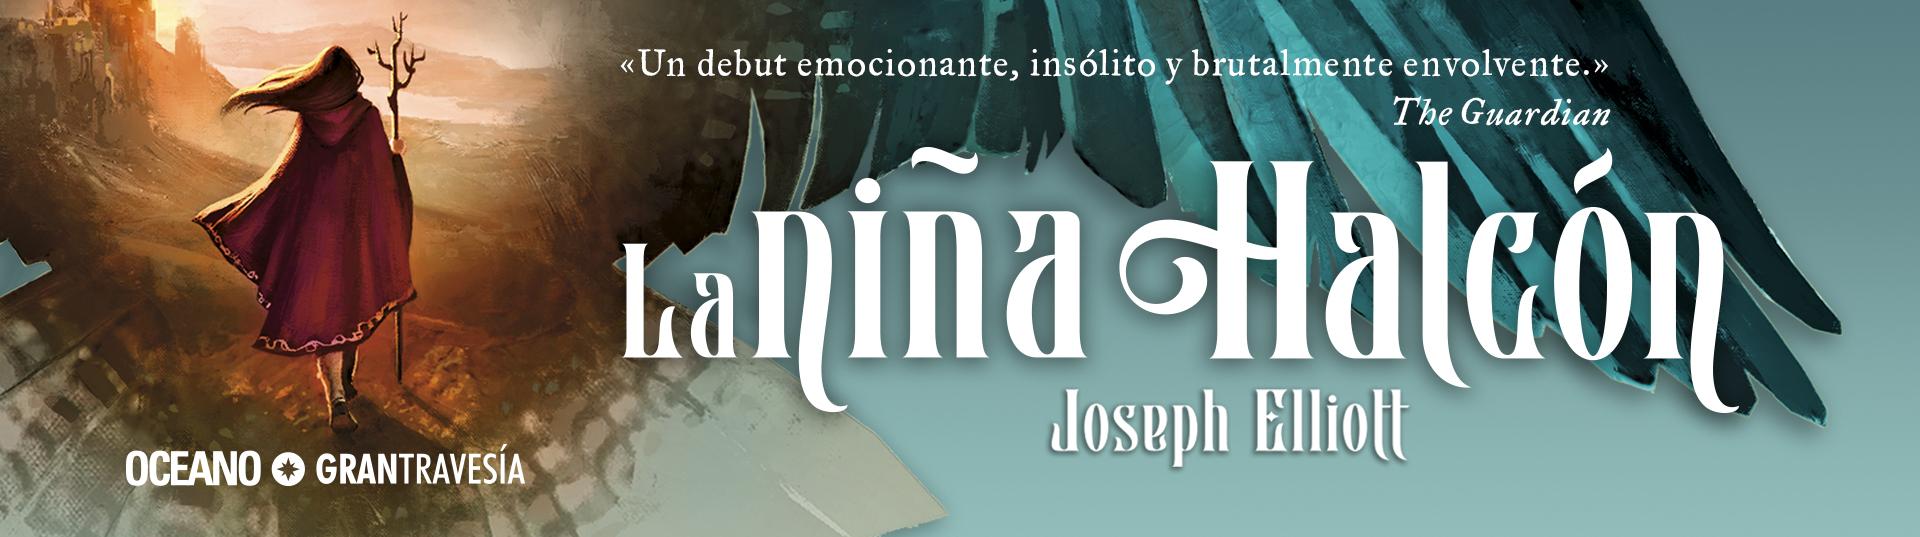 Blog_NinaHalcon